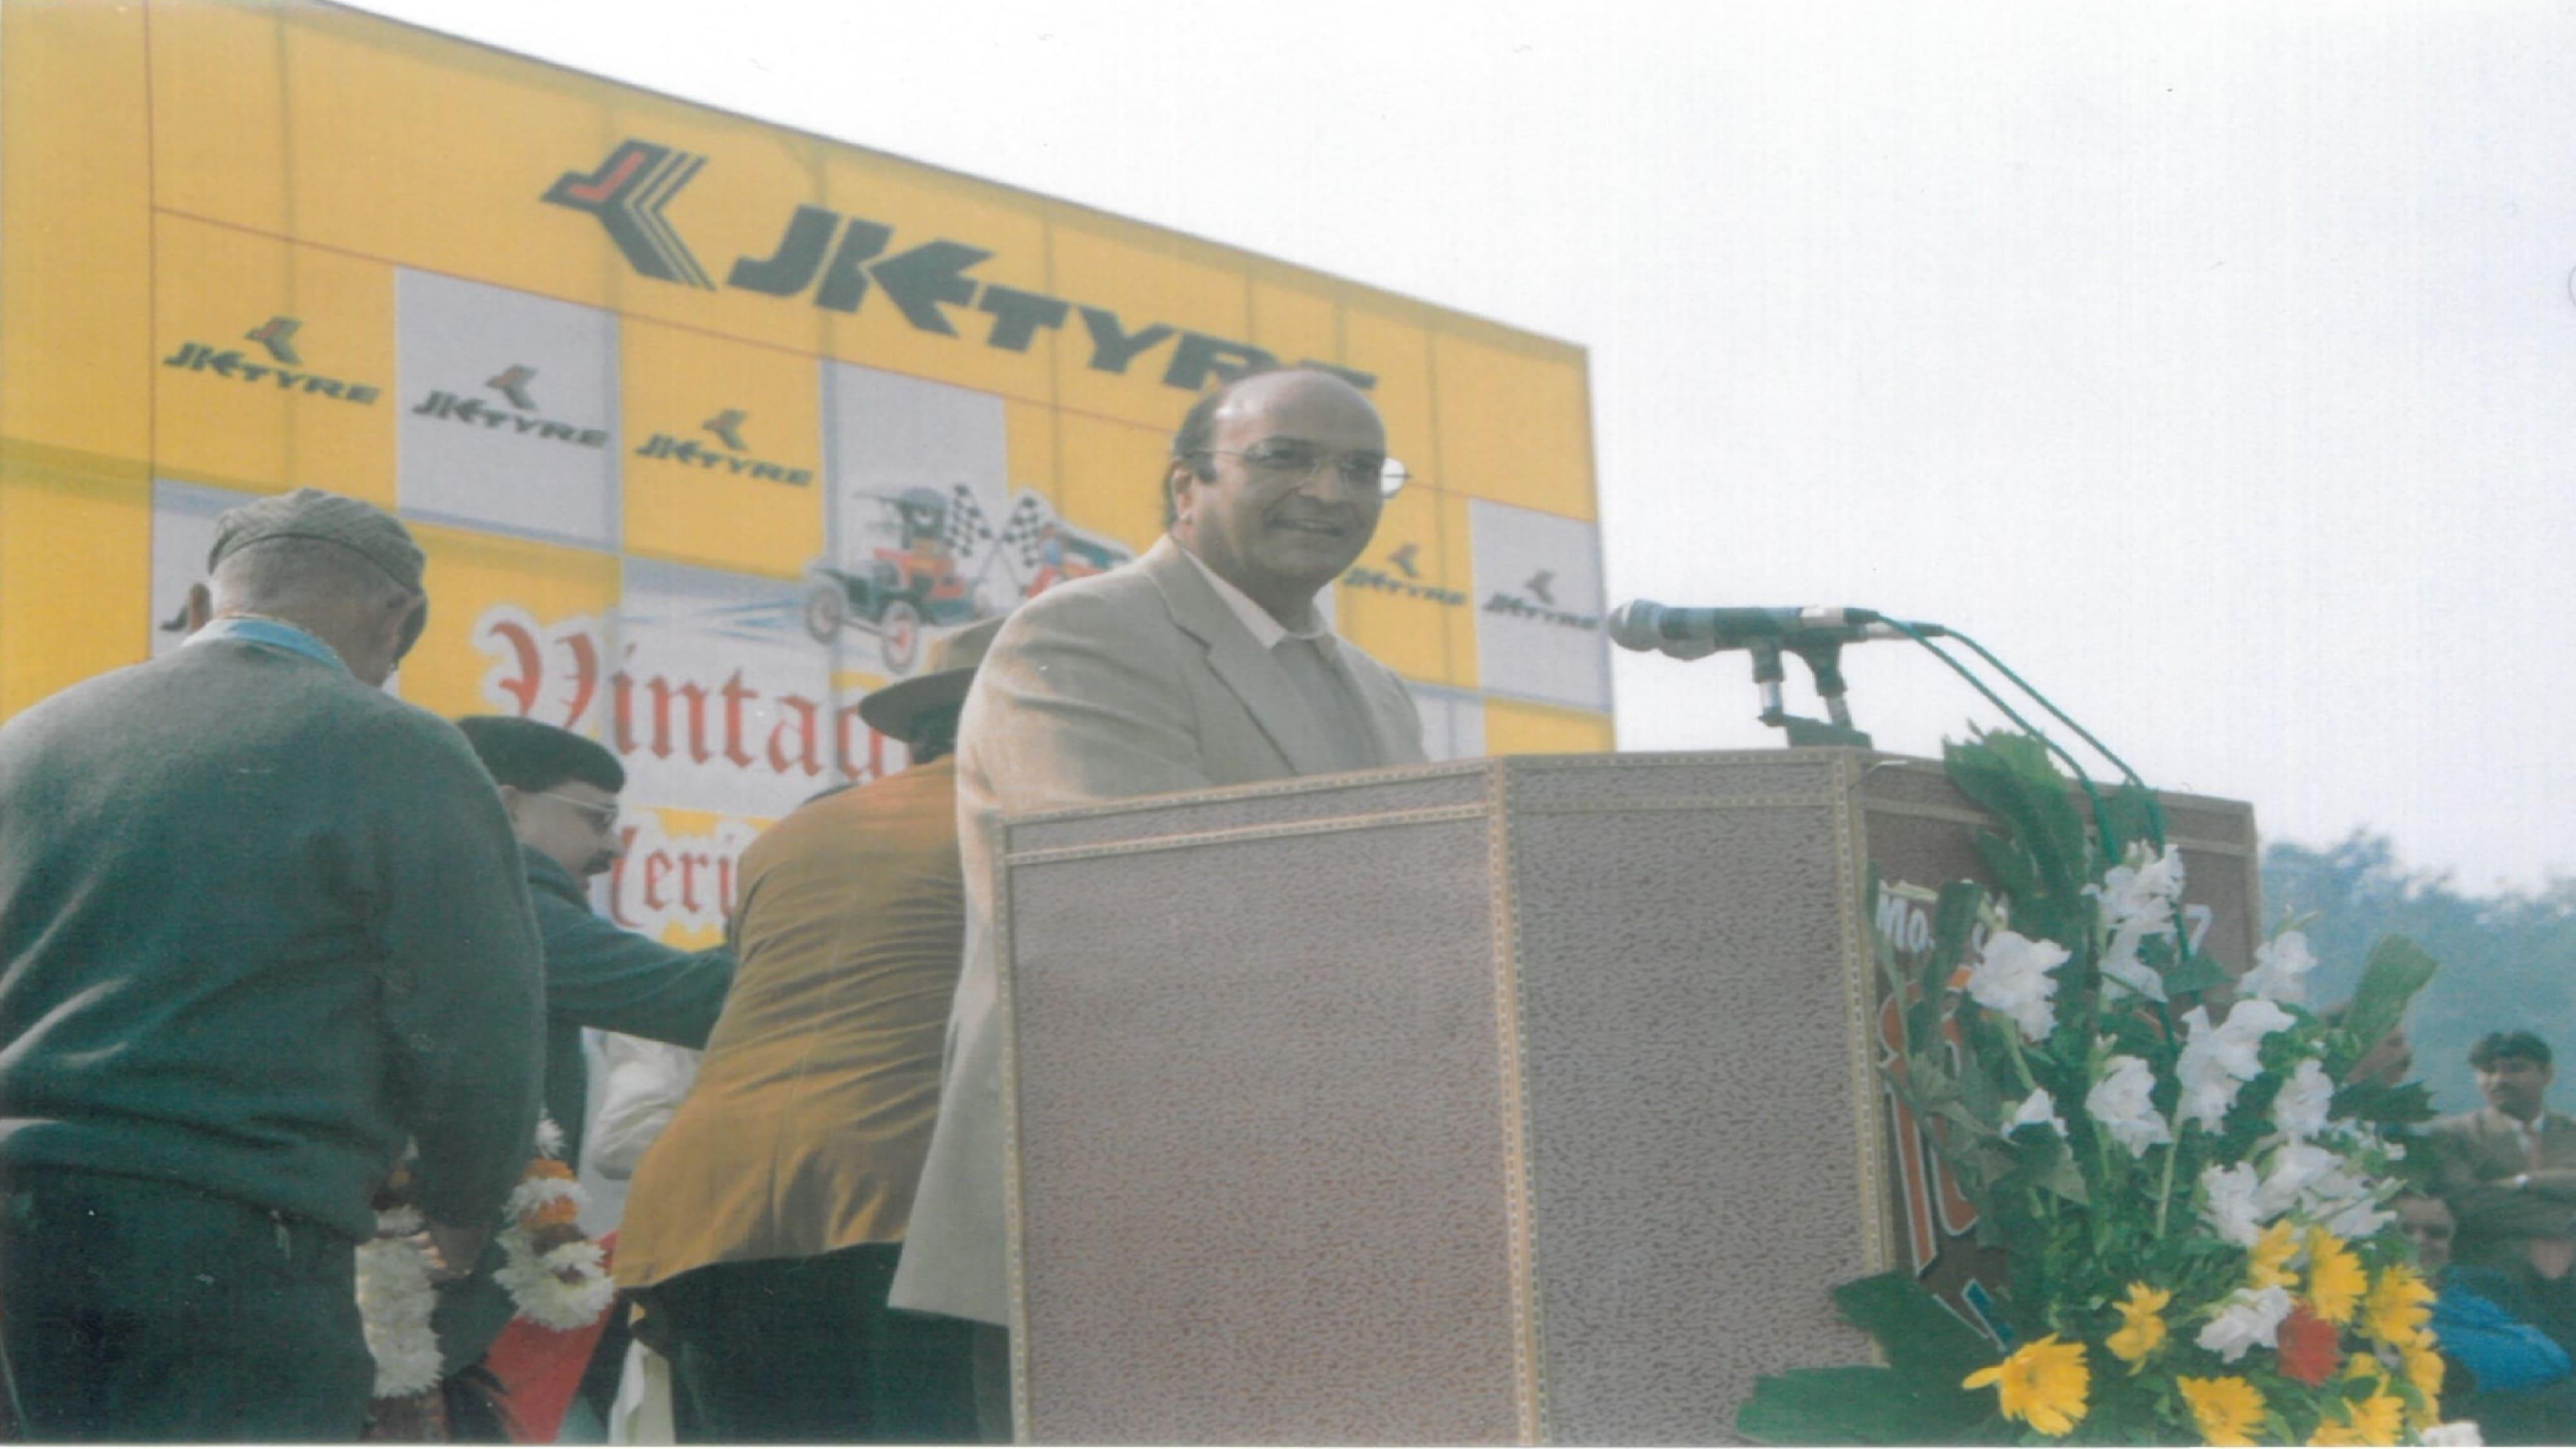 Dr. Raghupati Singhania addressing the elite audience.